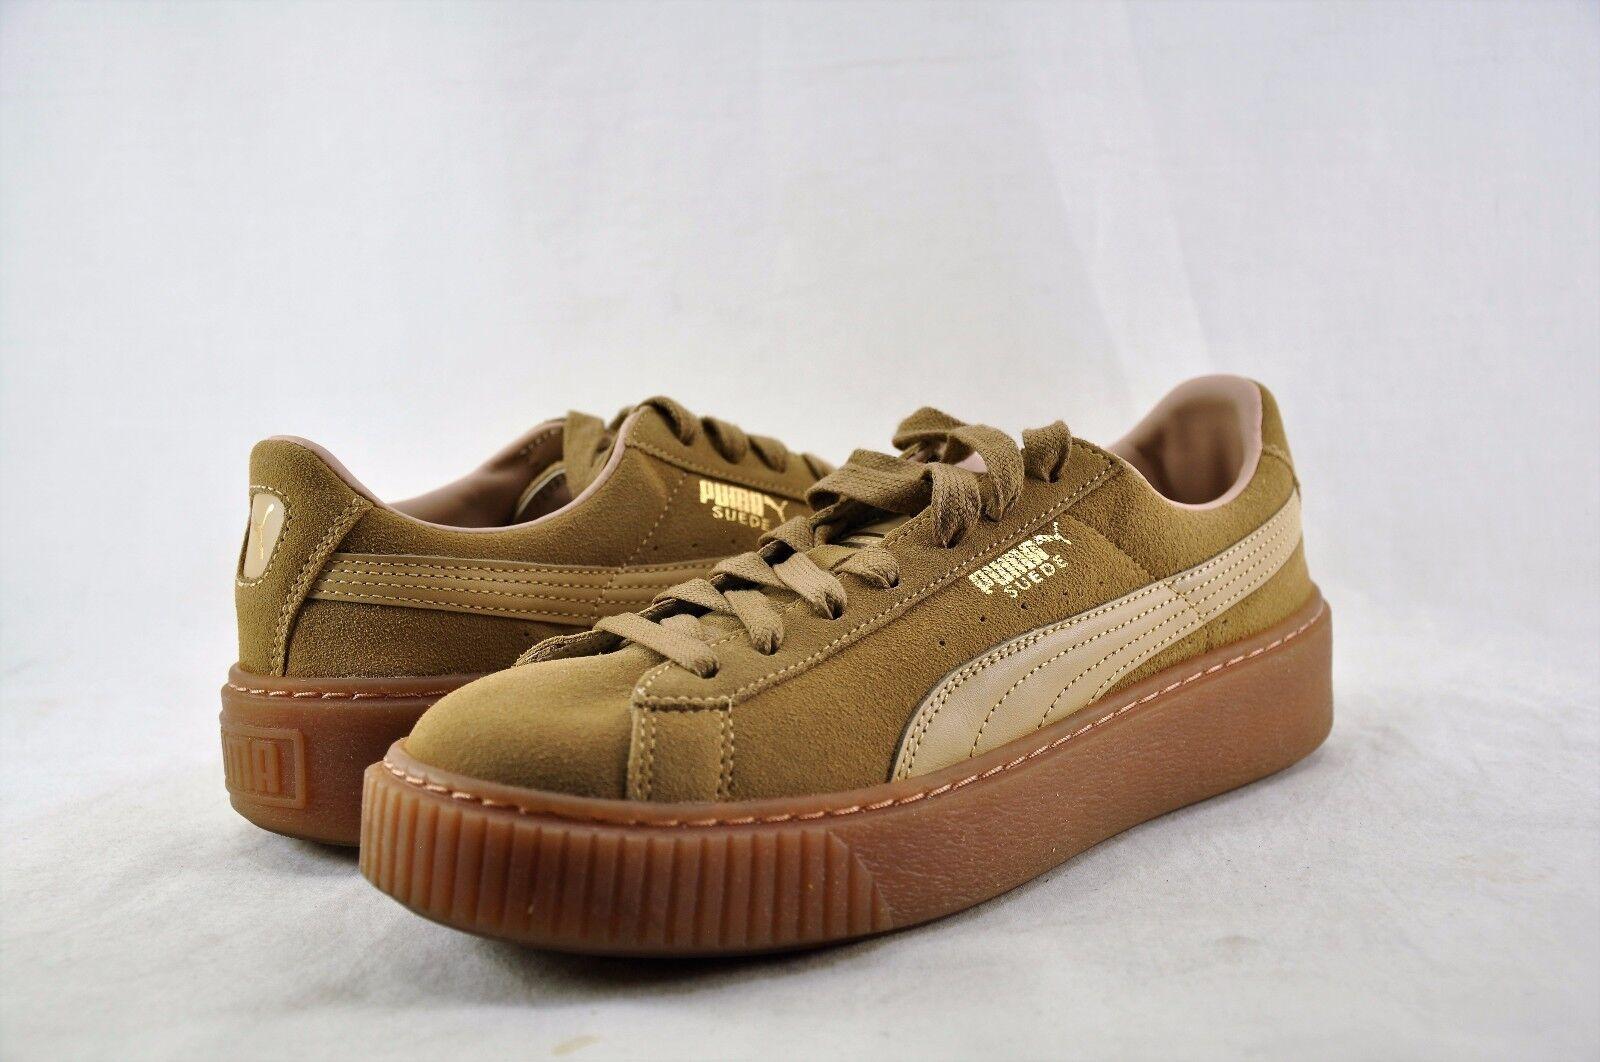 Women's Shoes Puma Suede Platform Core Oatmeal 36355903 Oatmeal Core Size 11 *New* 769a5e